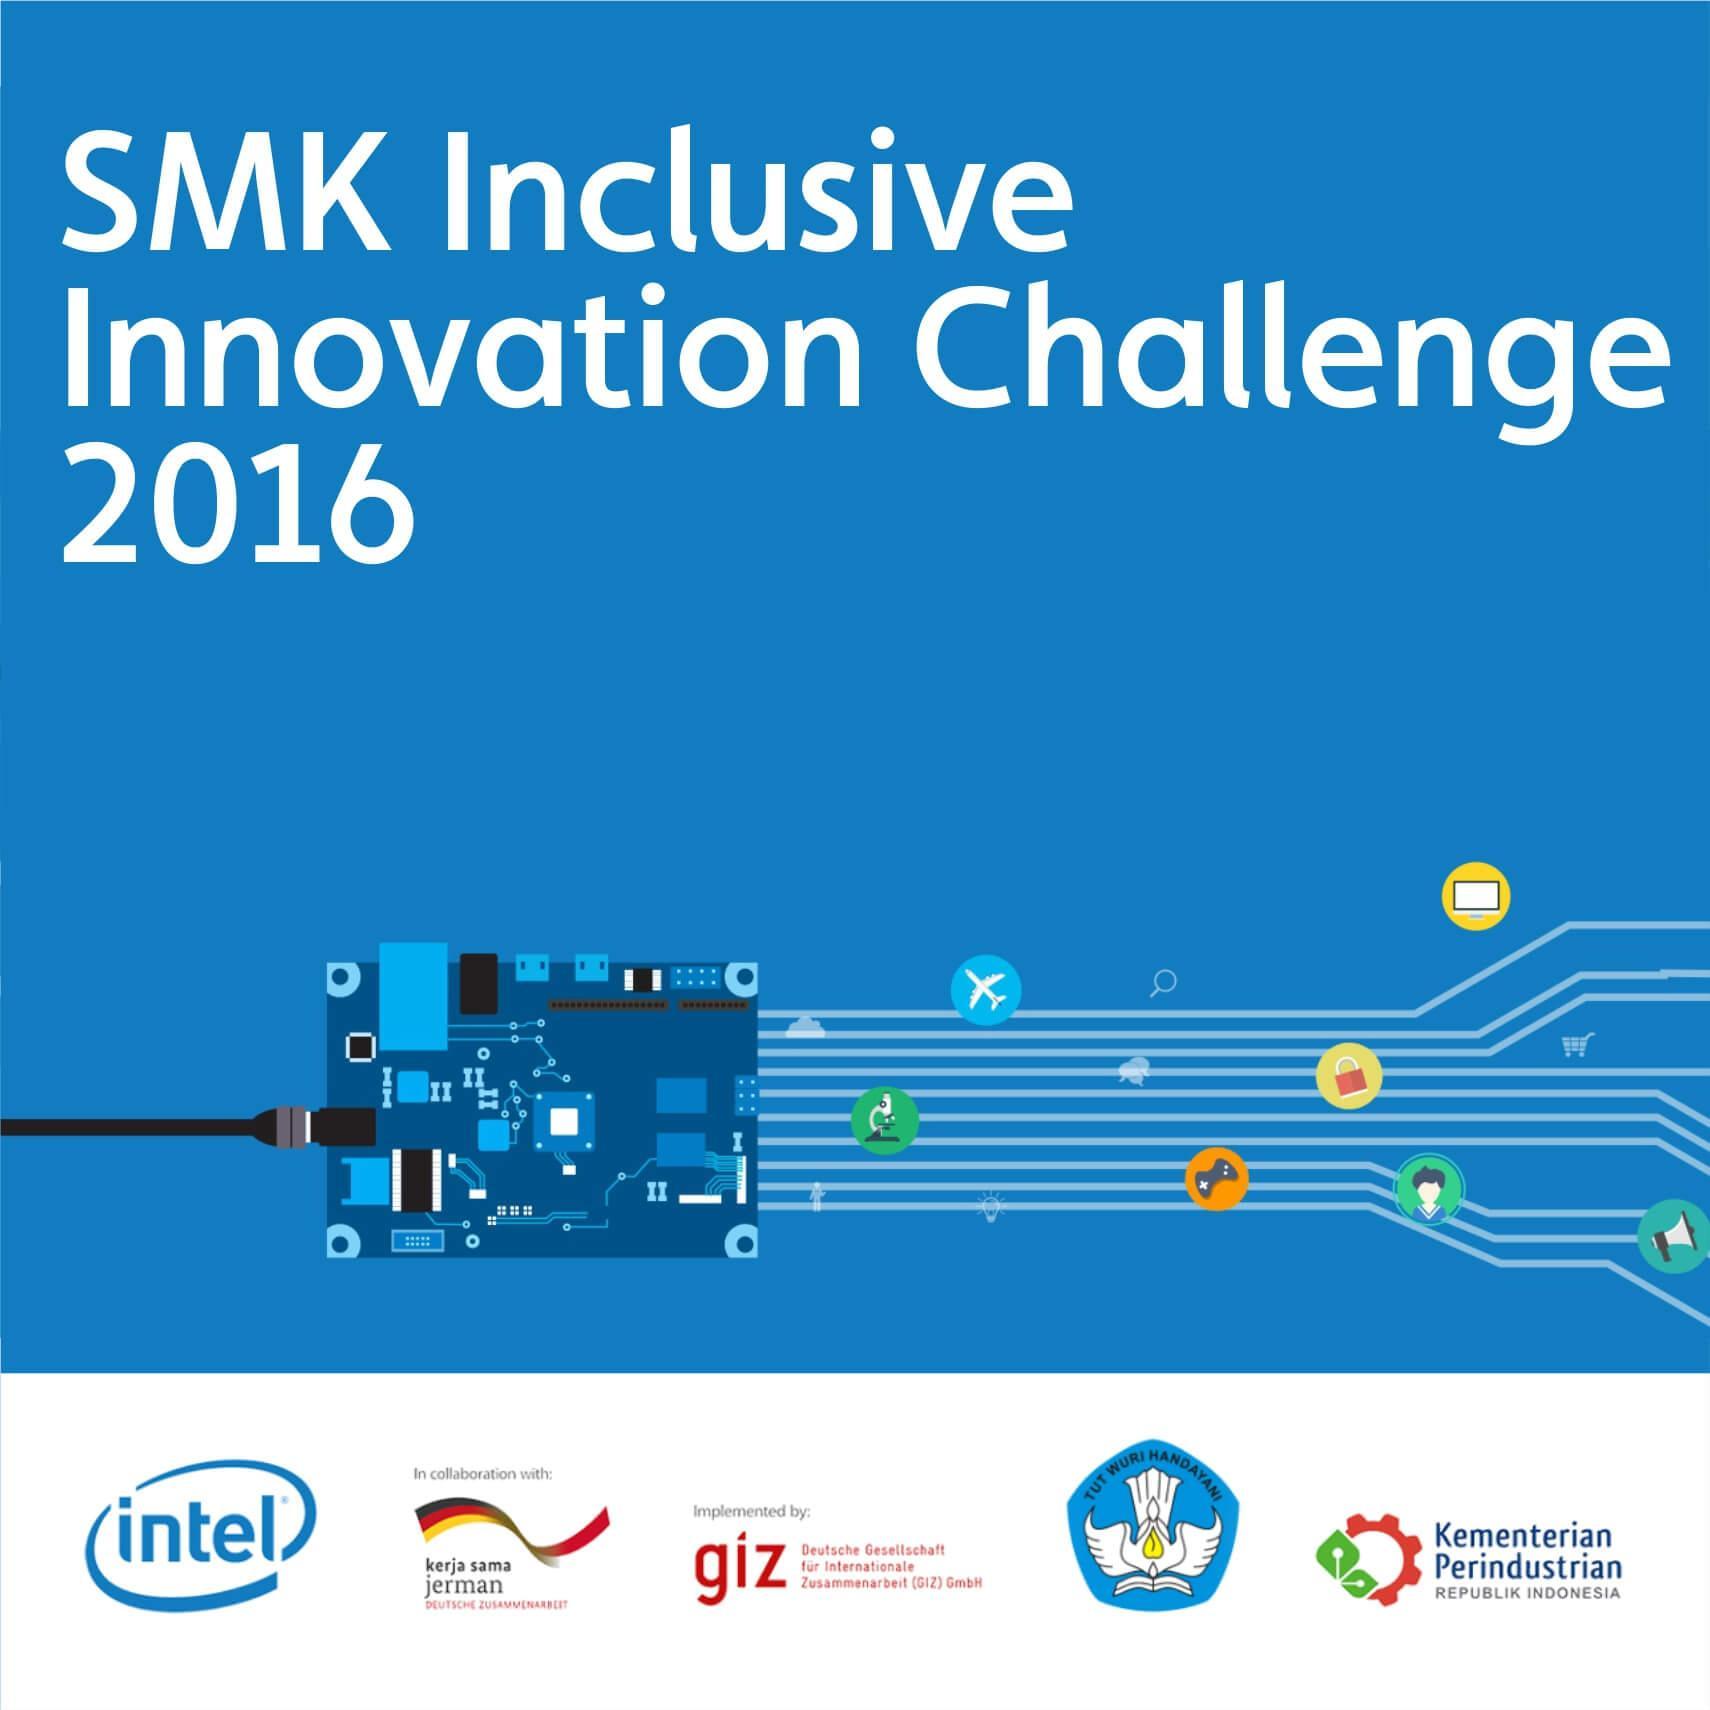 SMK Inclusive Innovation Challenge 2016: Award Ceremony, Innovation Training & Product Showcase